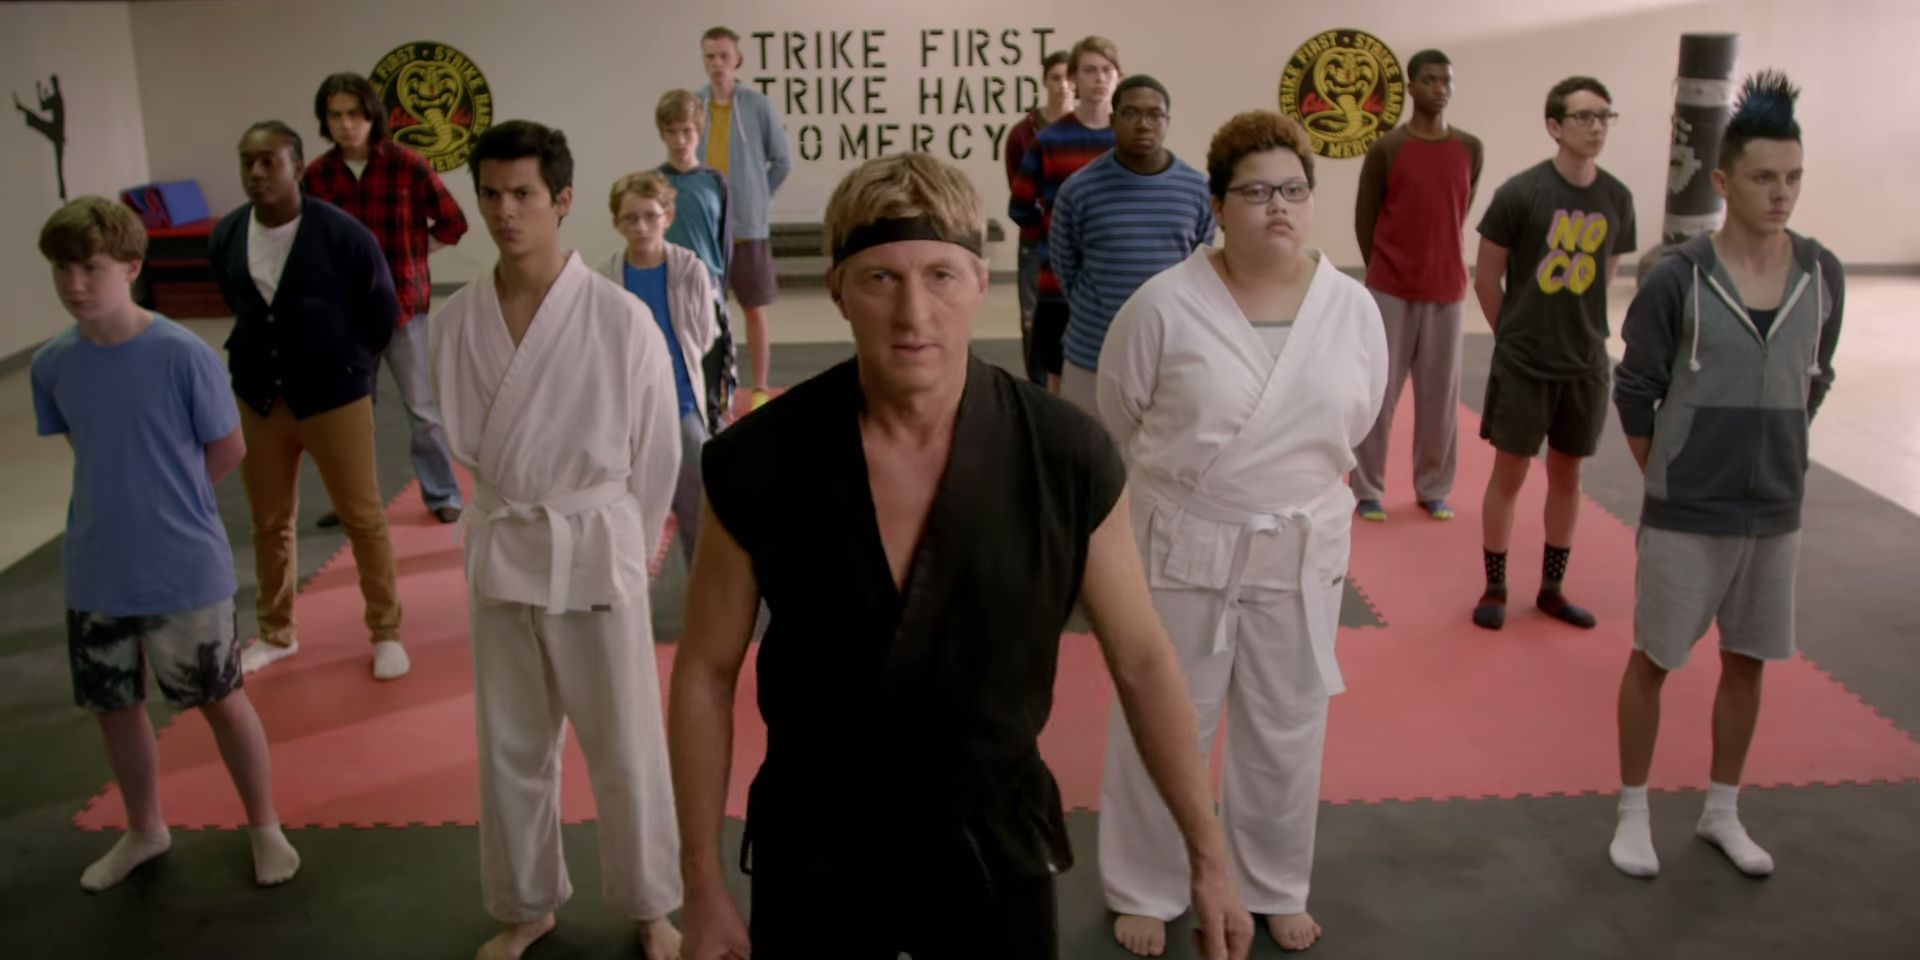 Cobra Kai Season 2 Sneak Peek Reunites Kreese and Lawrence